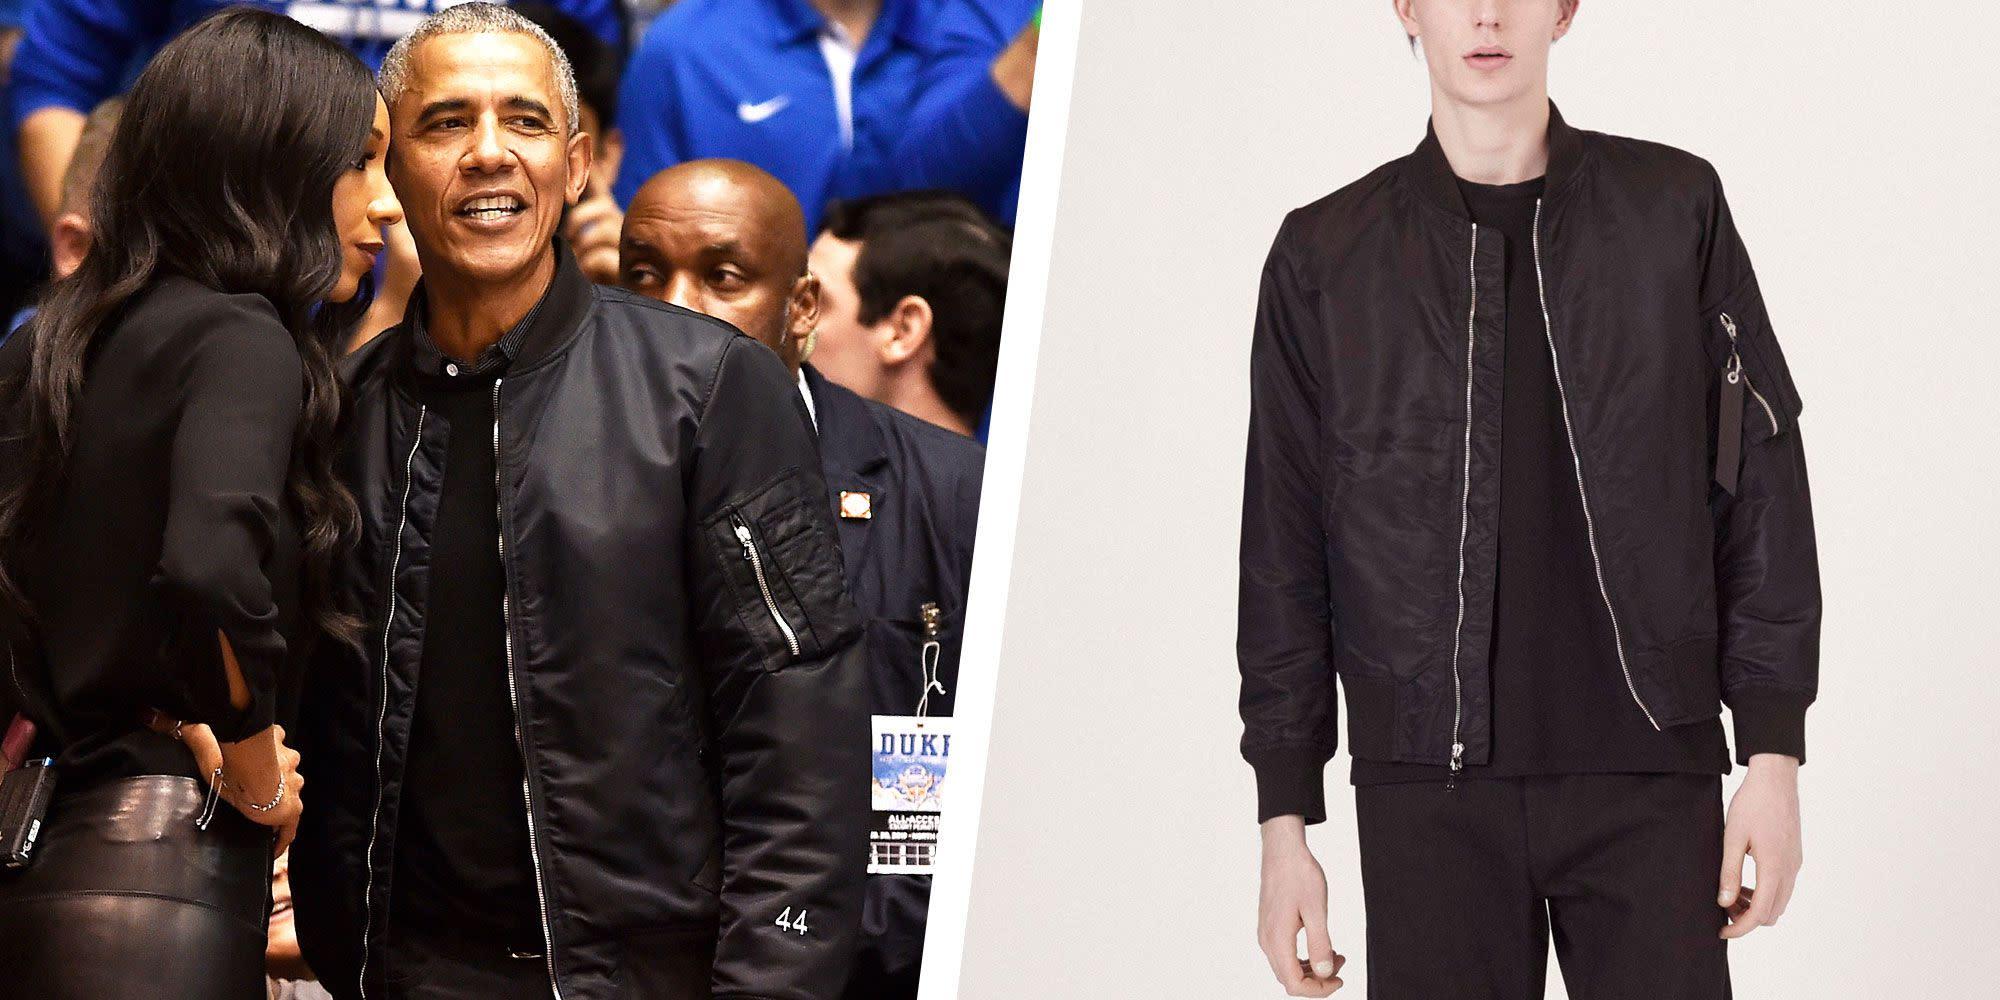 ac143fea3 Get Barack Obama's Undeniably Cool Bomber Jacket Look